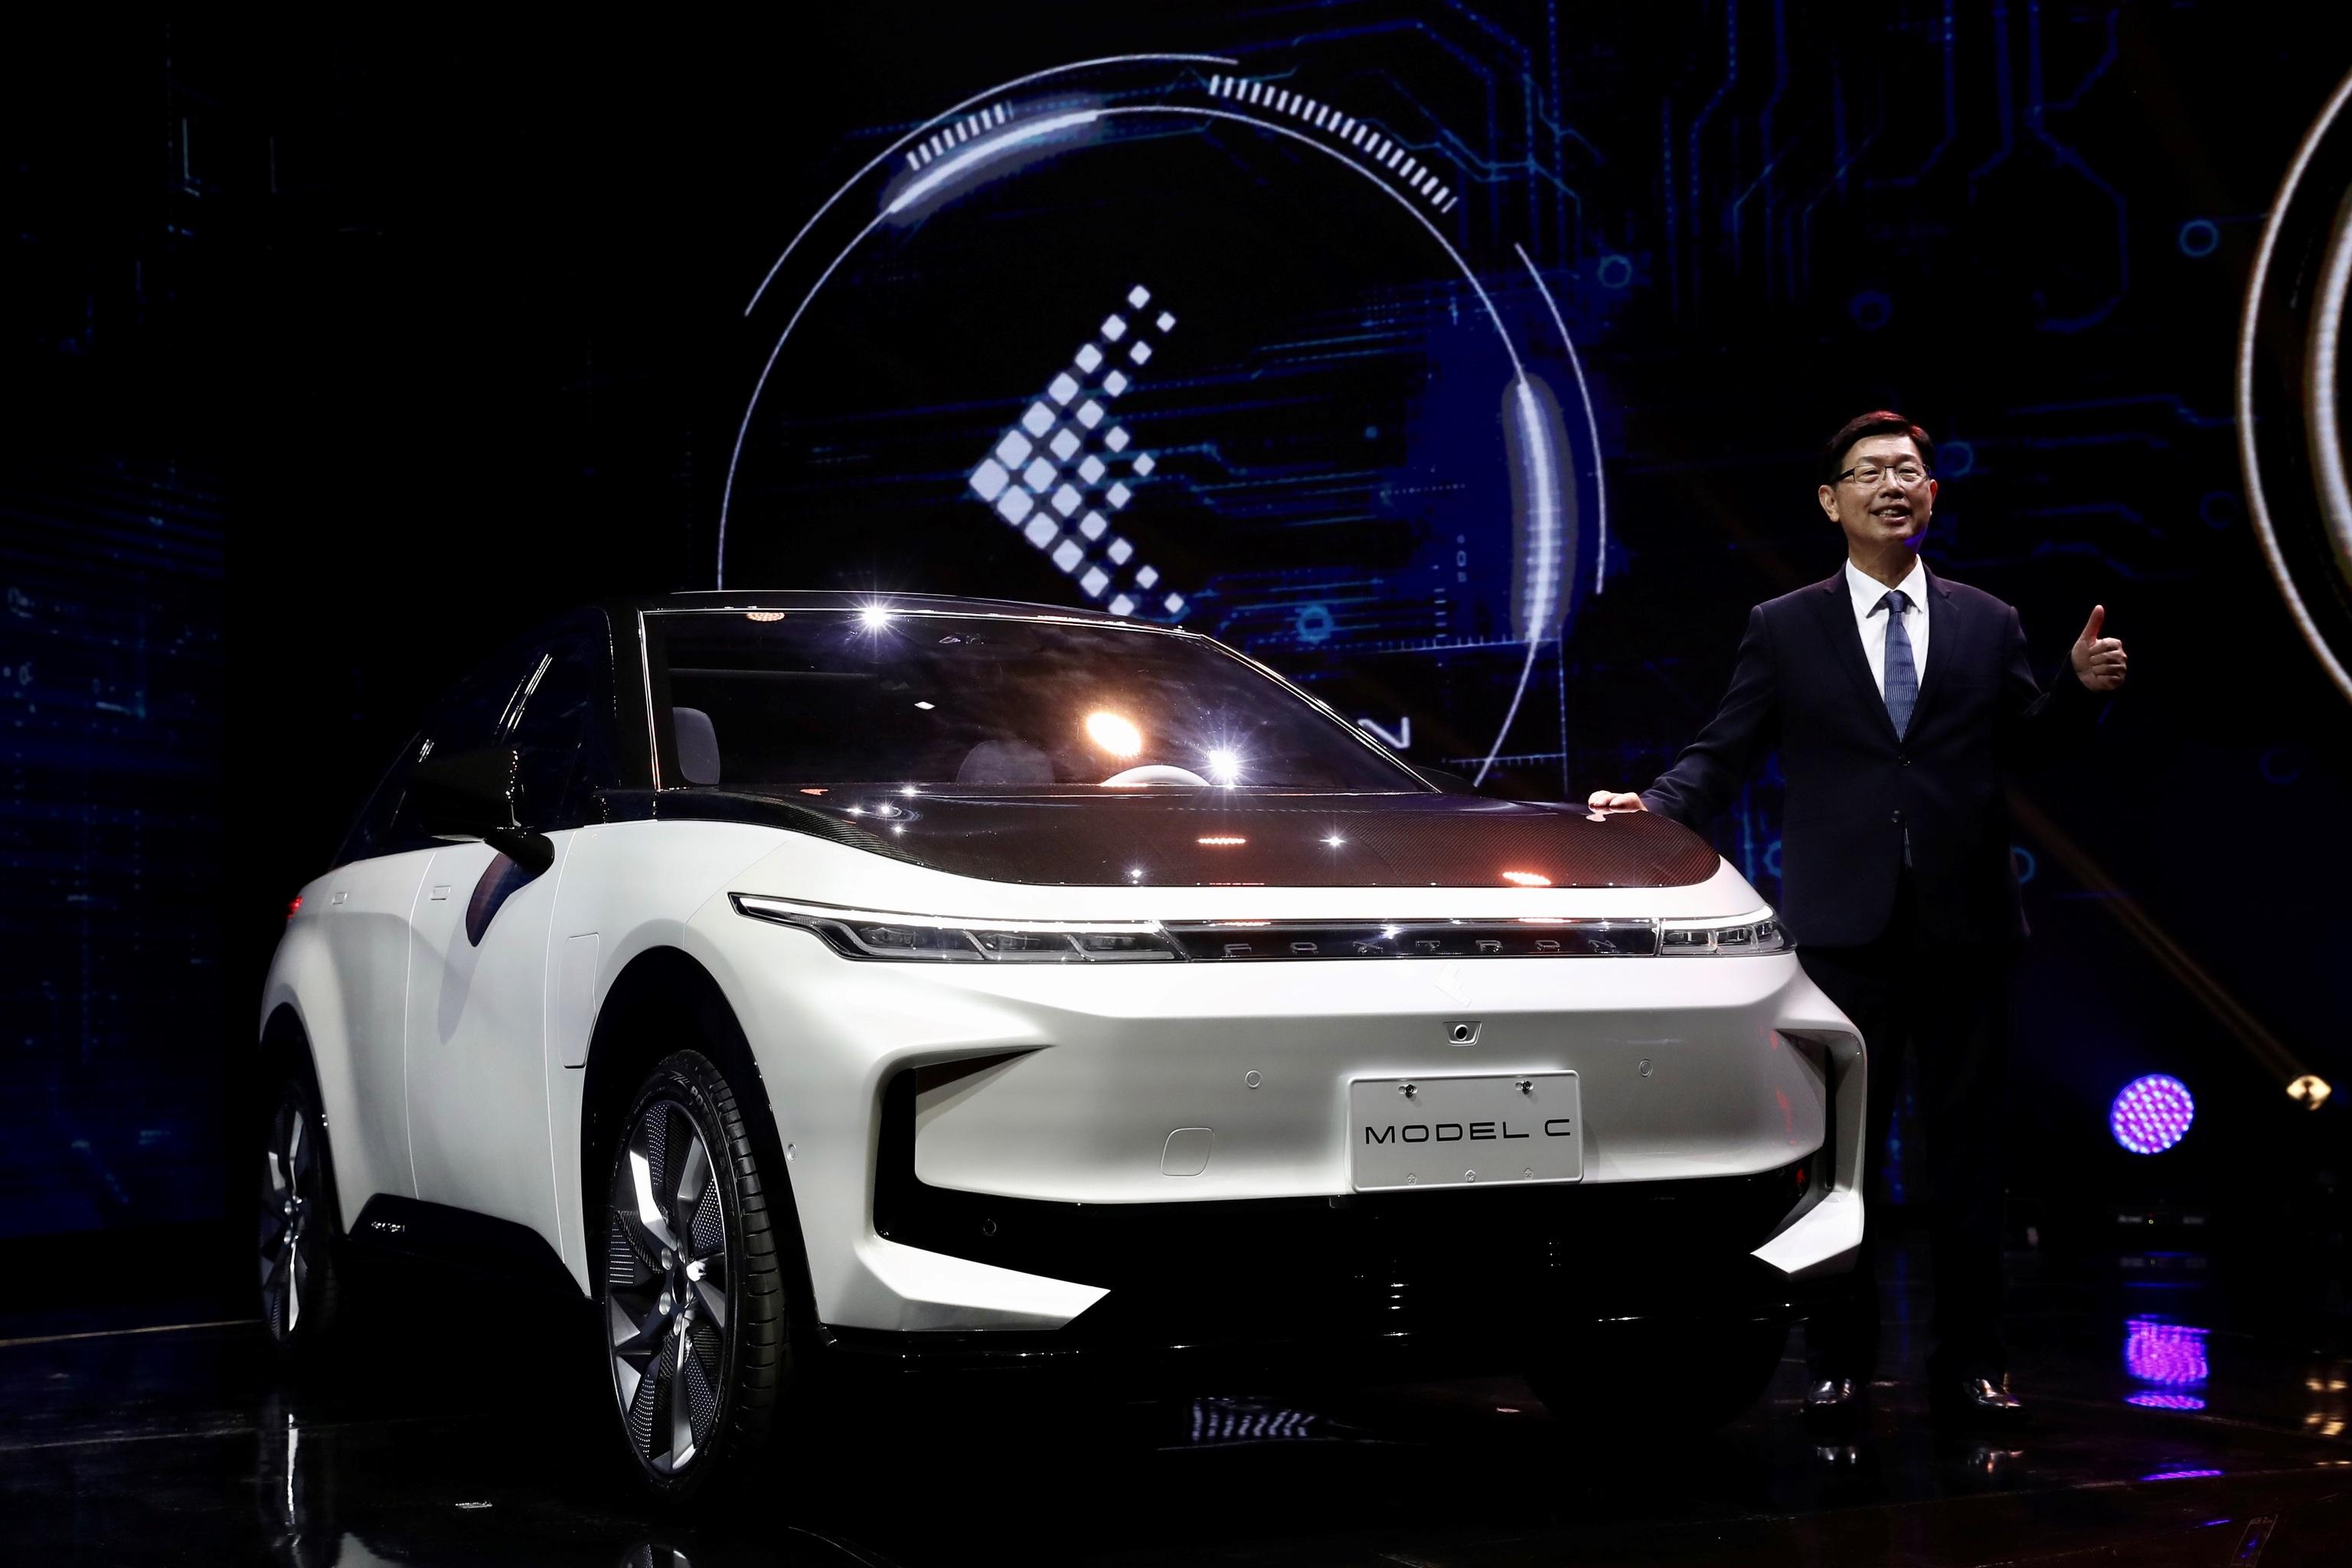 El presidente de Foxxconn, Young Liu, posa junto al Model C, que estaría listo para comercializarse en 2023 por unos 30.000 euros.